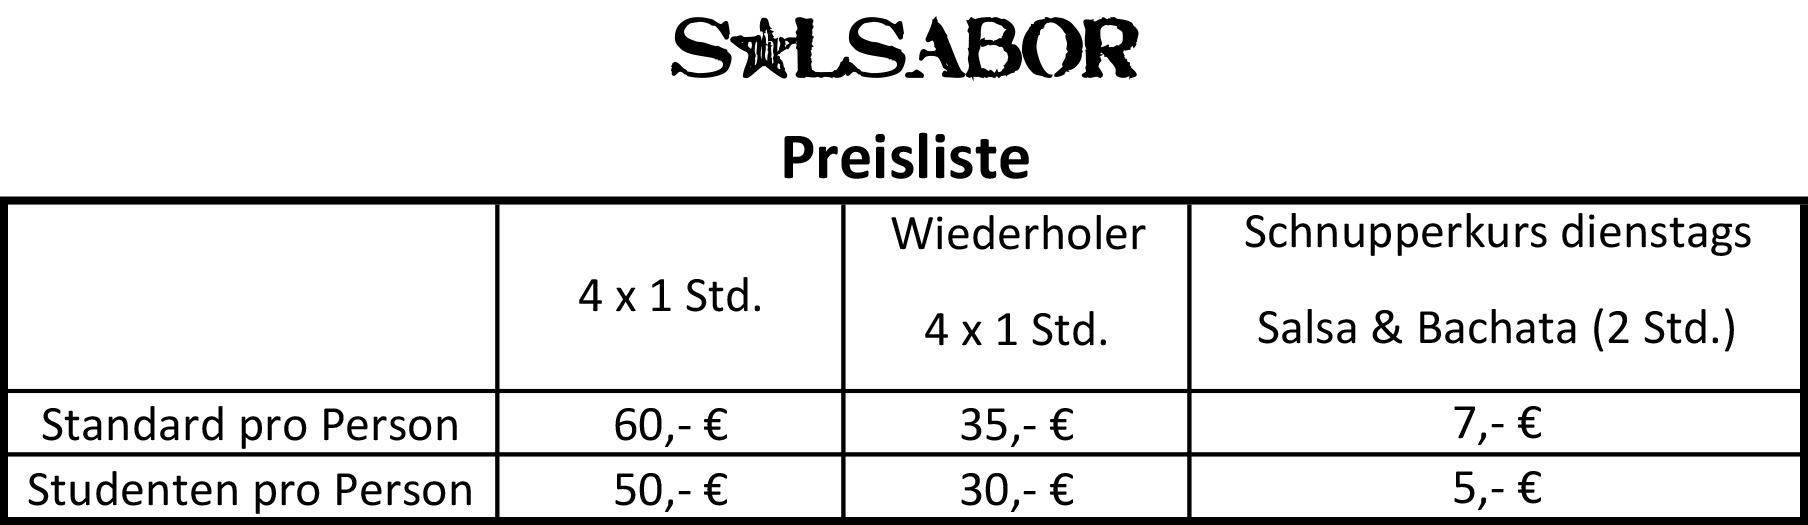 Salsabor Corona Preisliste